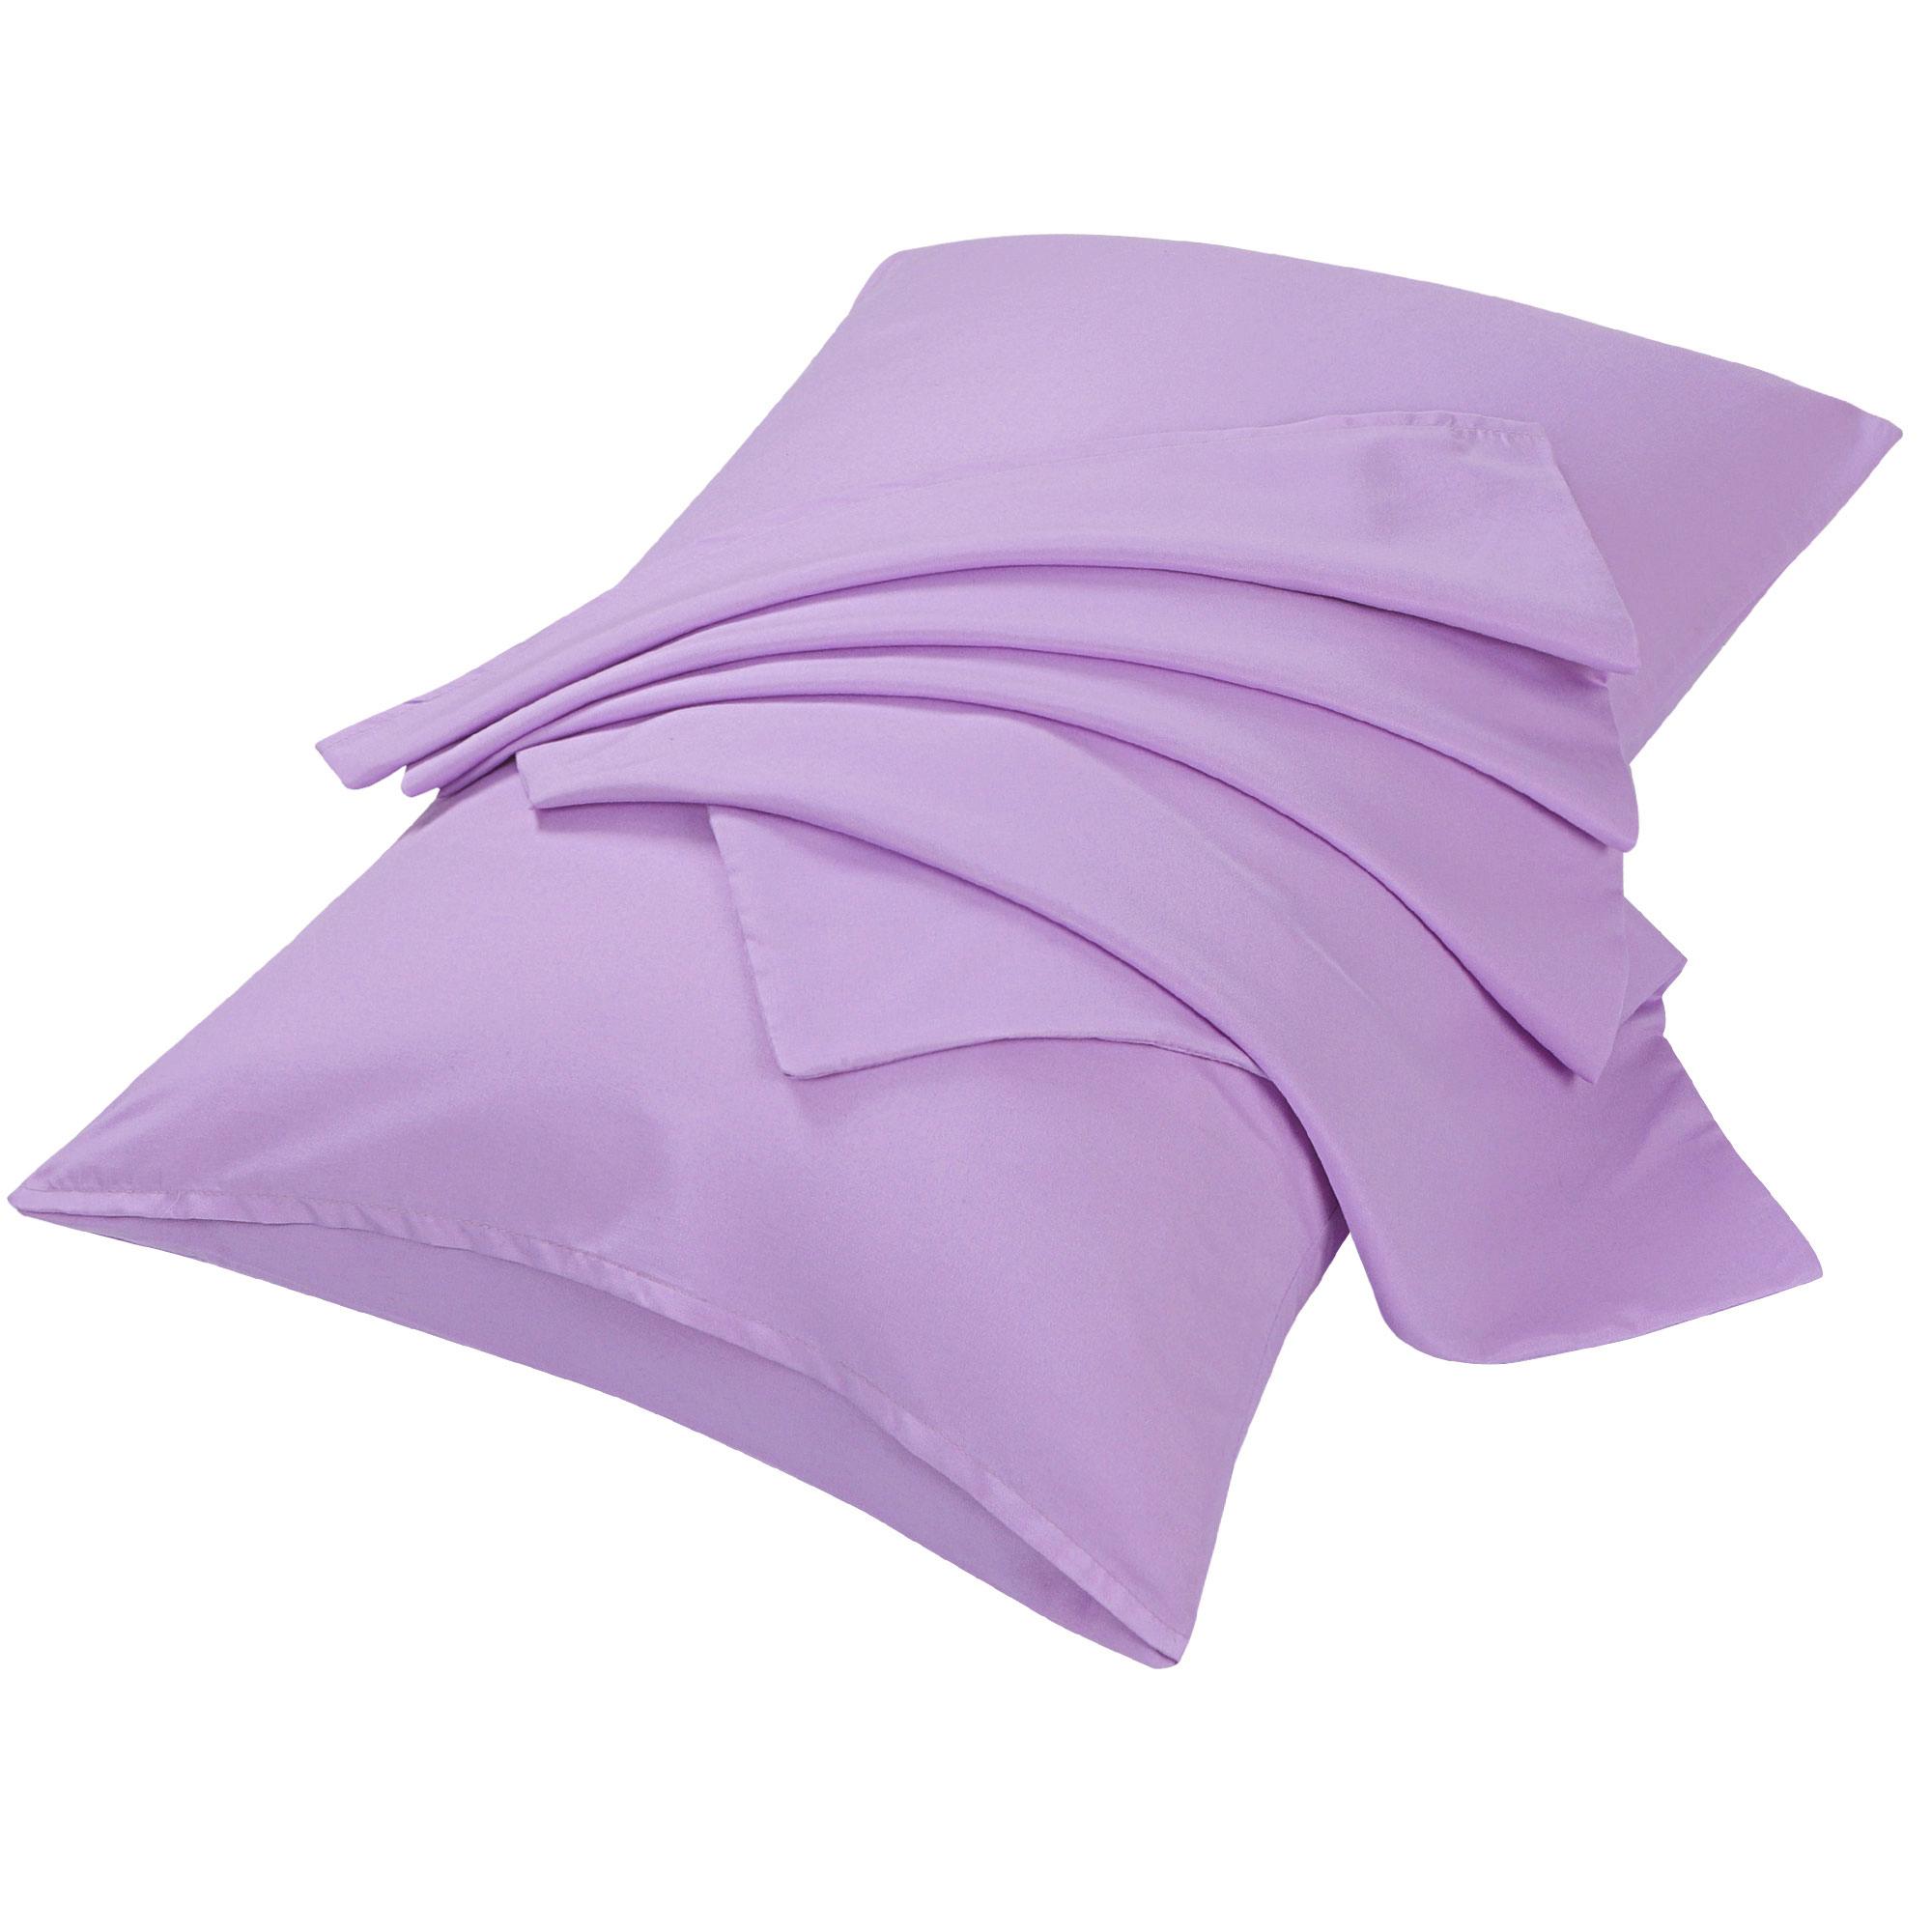 "2pcs Pillowcases Soft Microfiber, No Wrinkle, Light Purple Queen (20"" x 30"")"